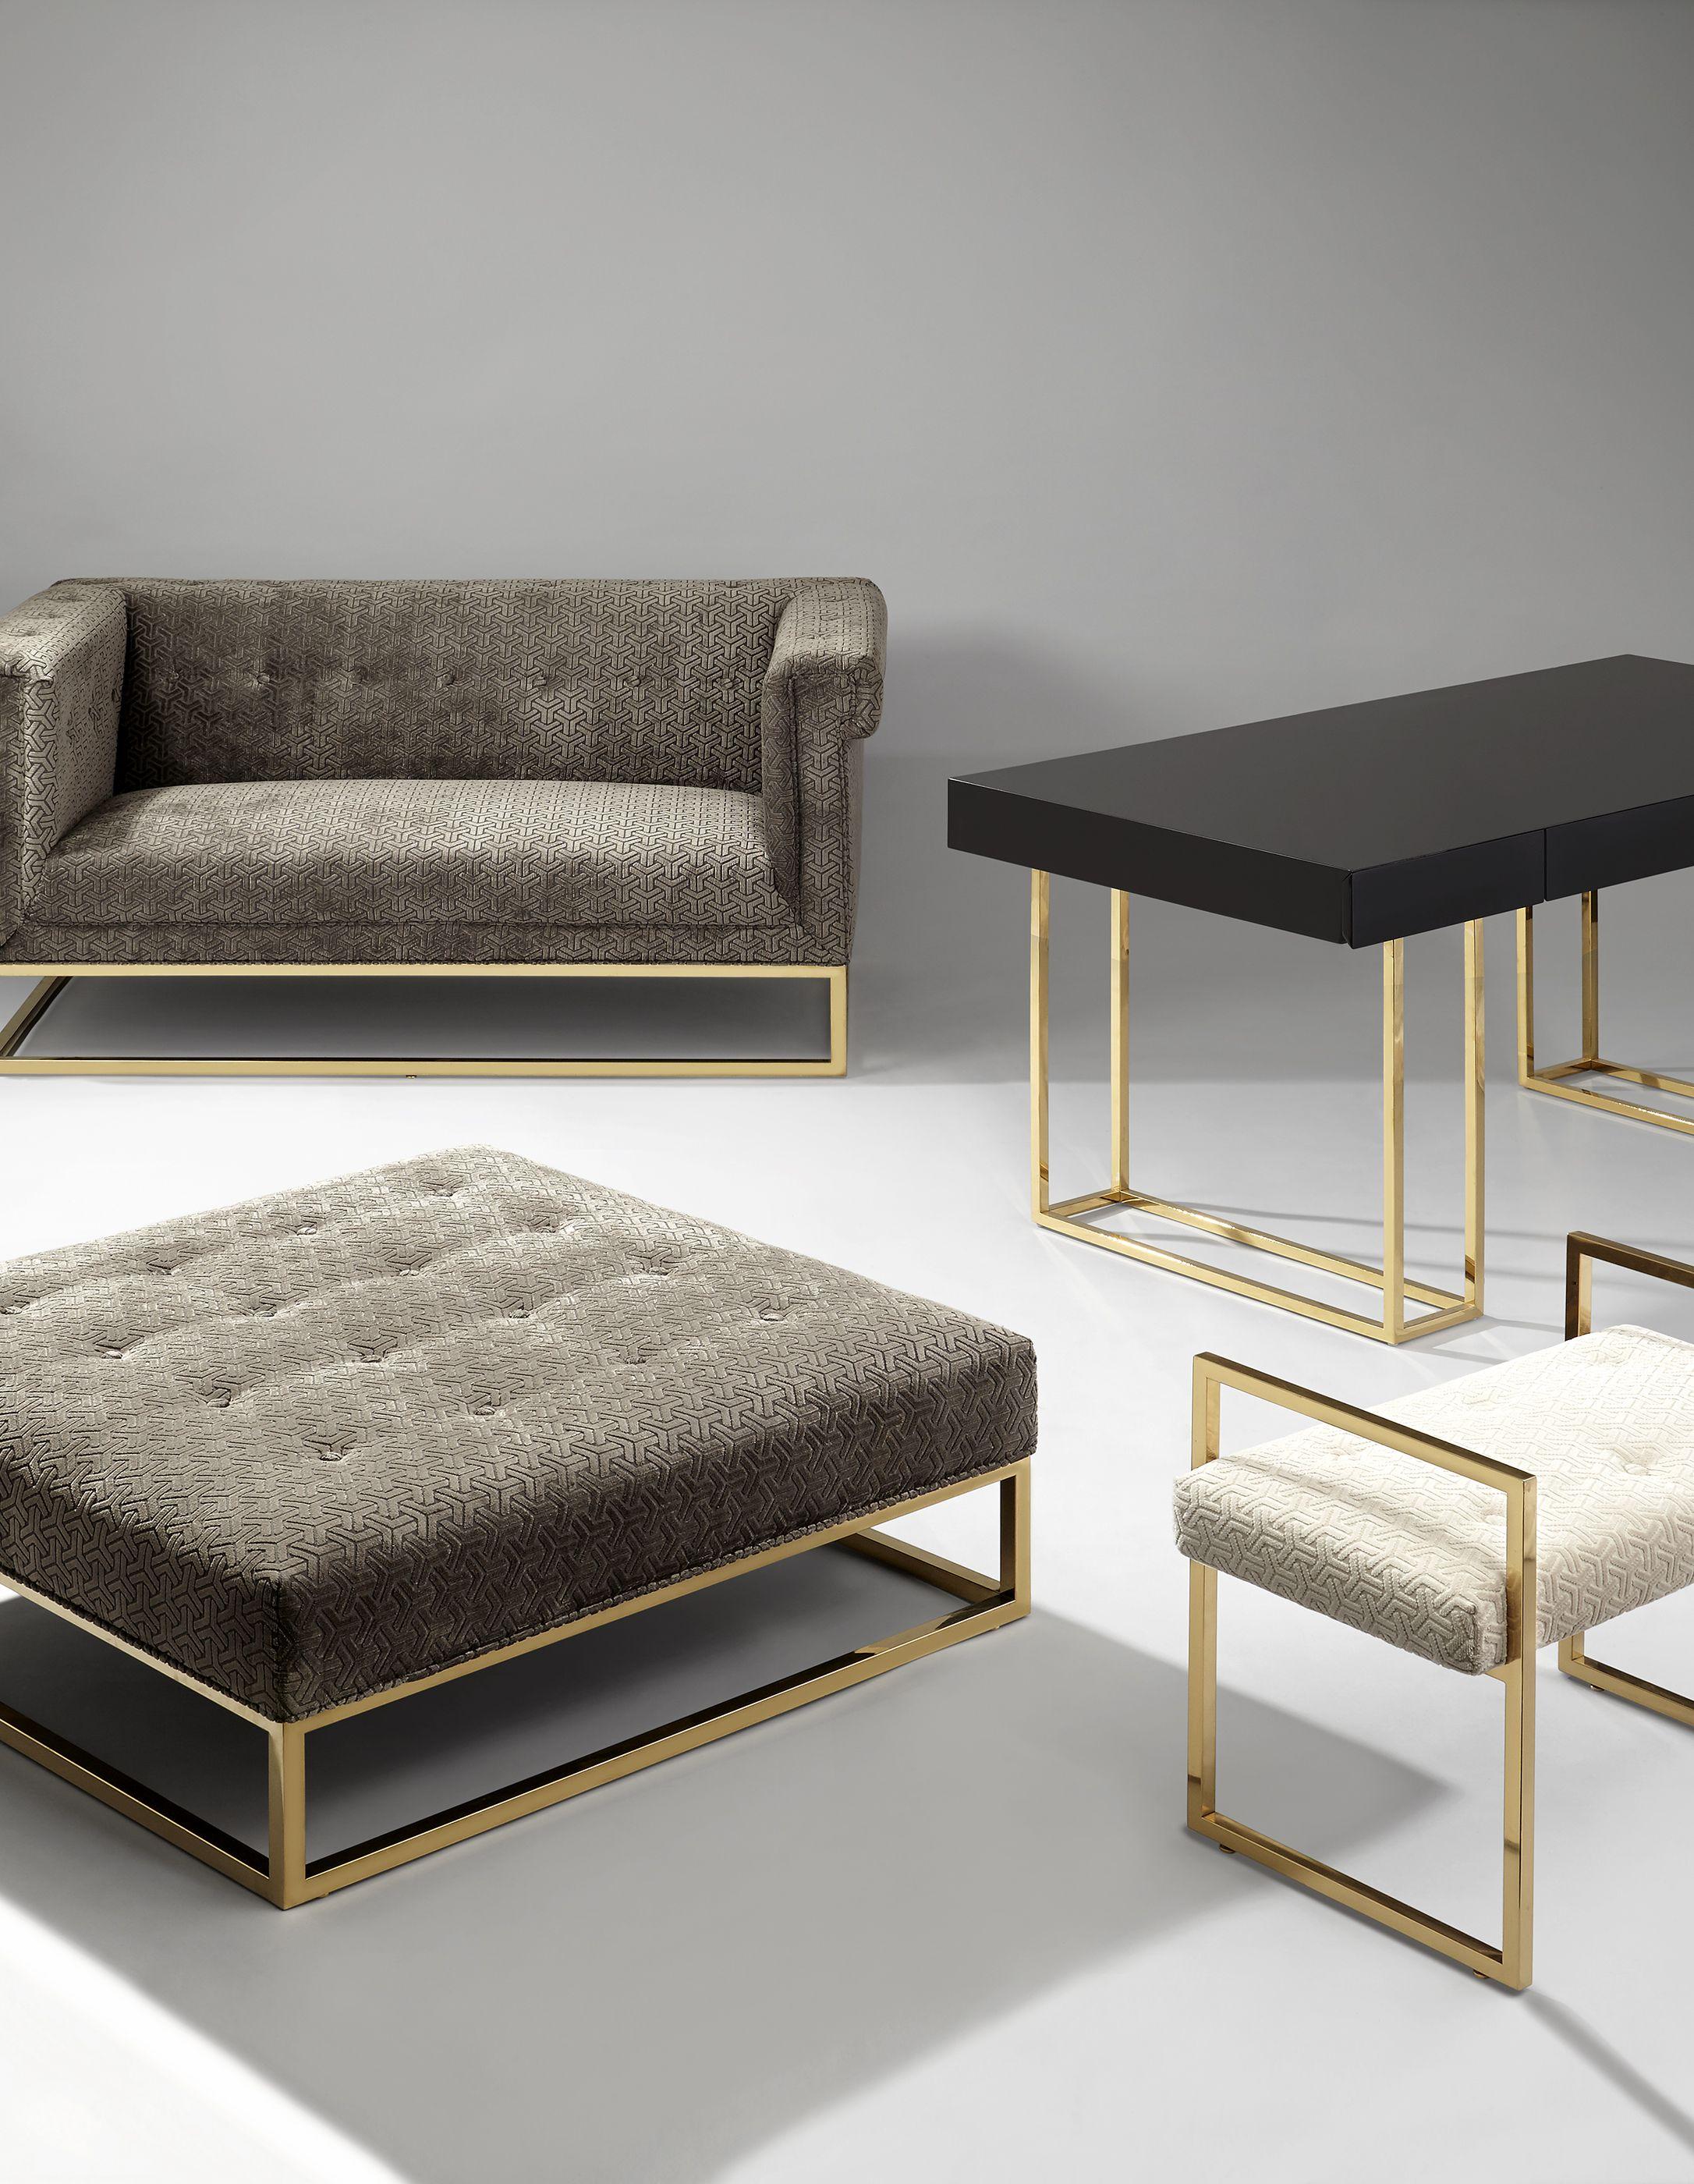 mueble ingl s estos muebles son una mezcla de el ingl s. Black Bedroom Furniture Sets. Home Design Ideas